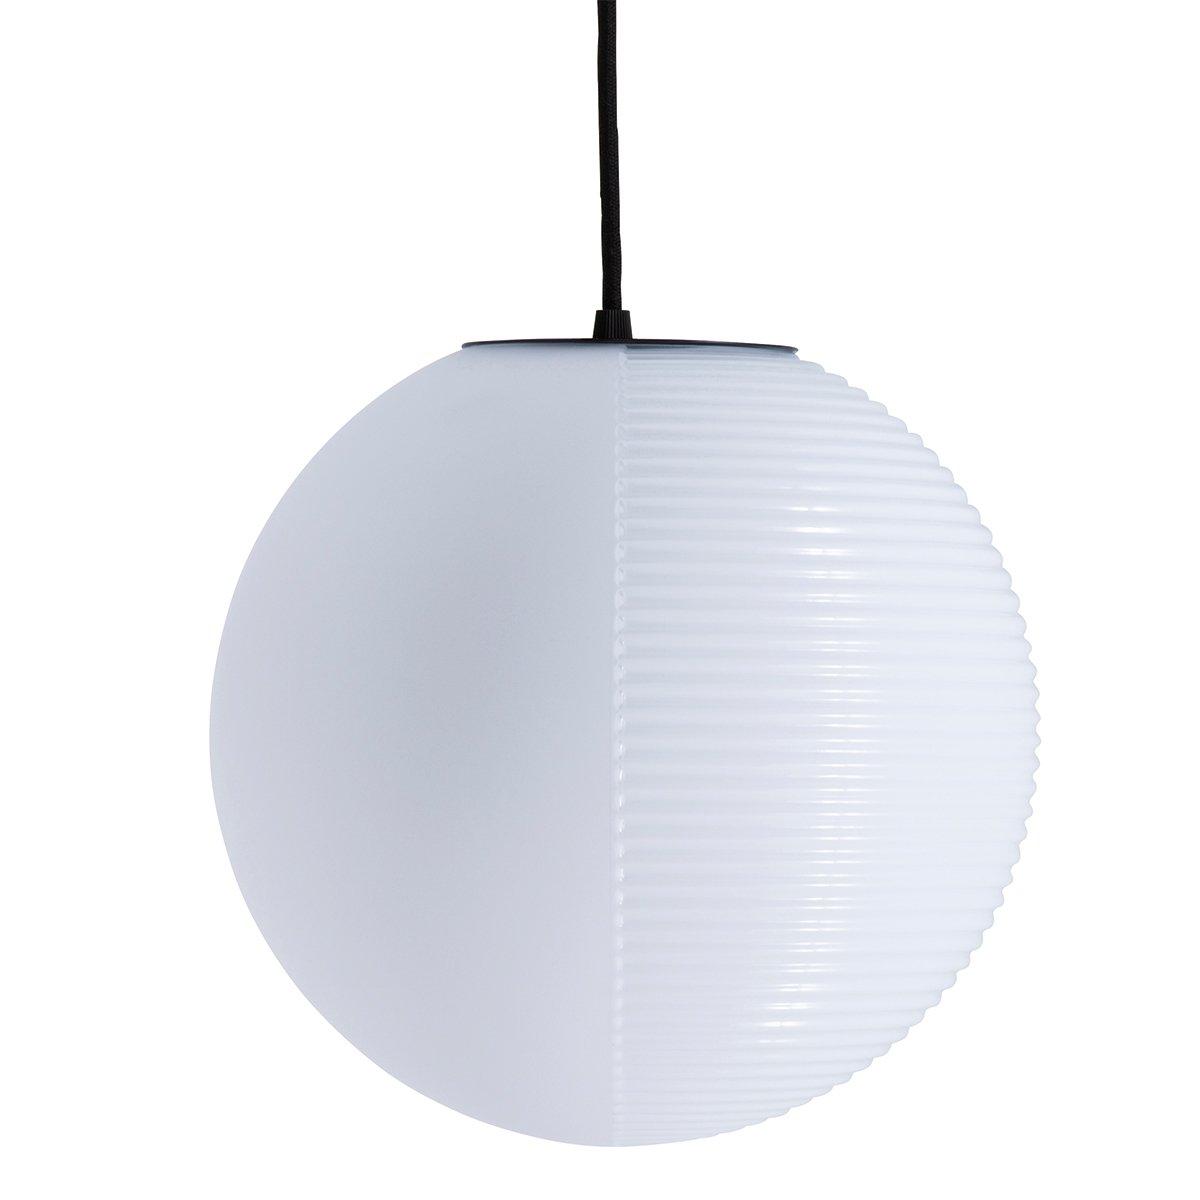 Pulpo Stellar Hanglamp Medium - Wit (2018)